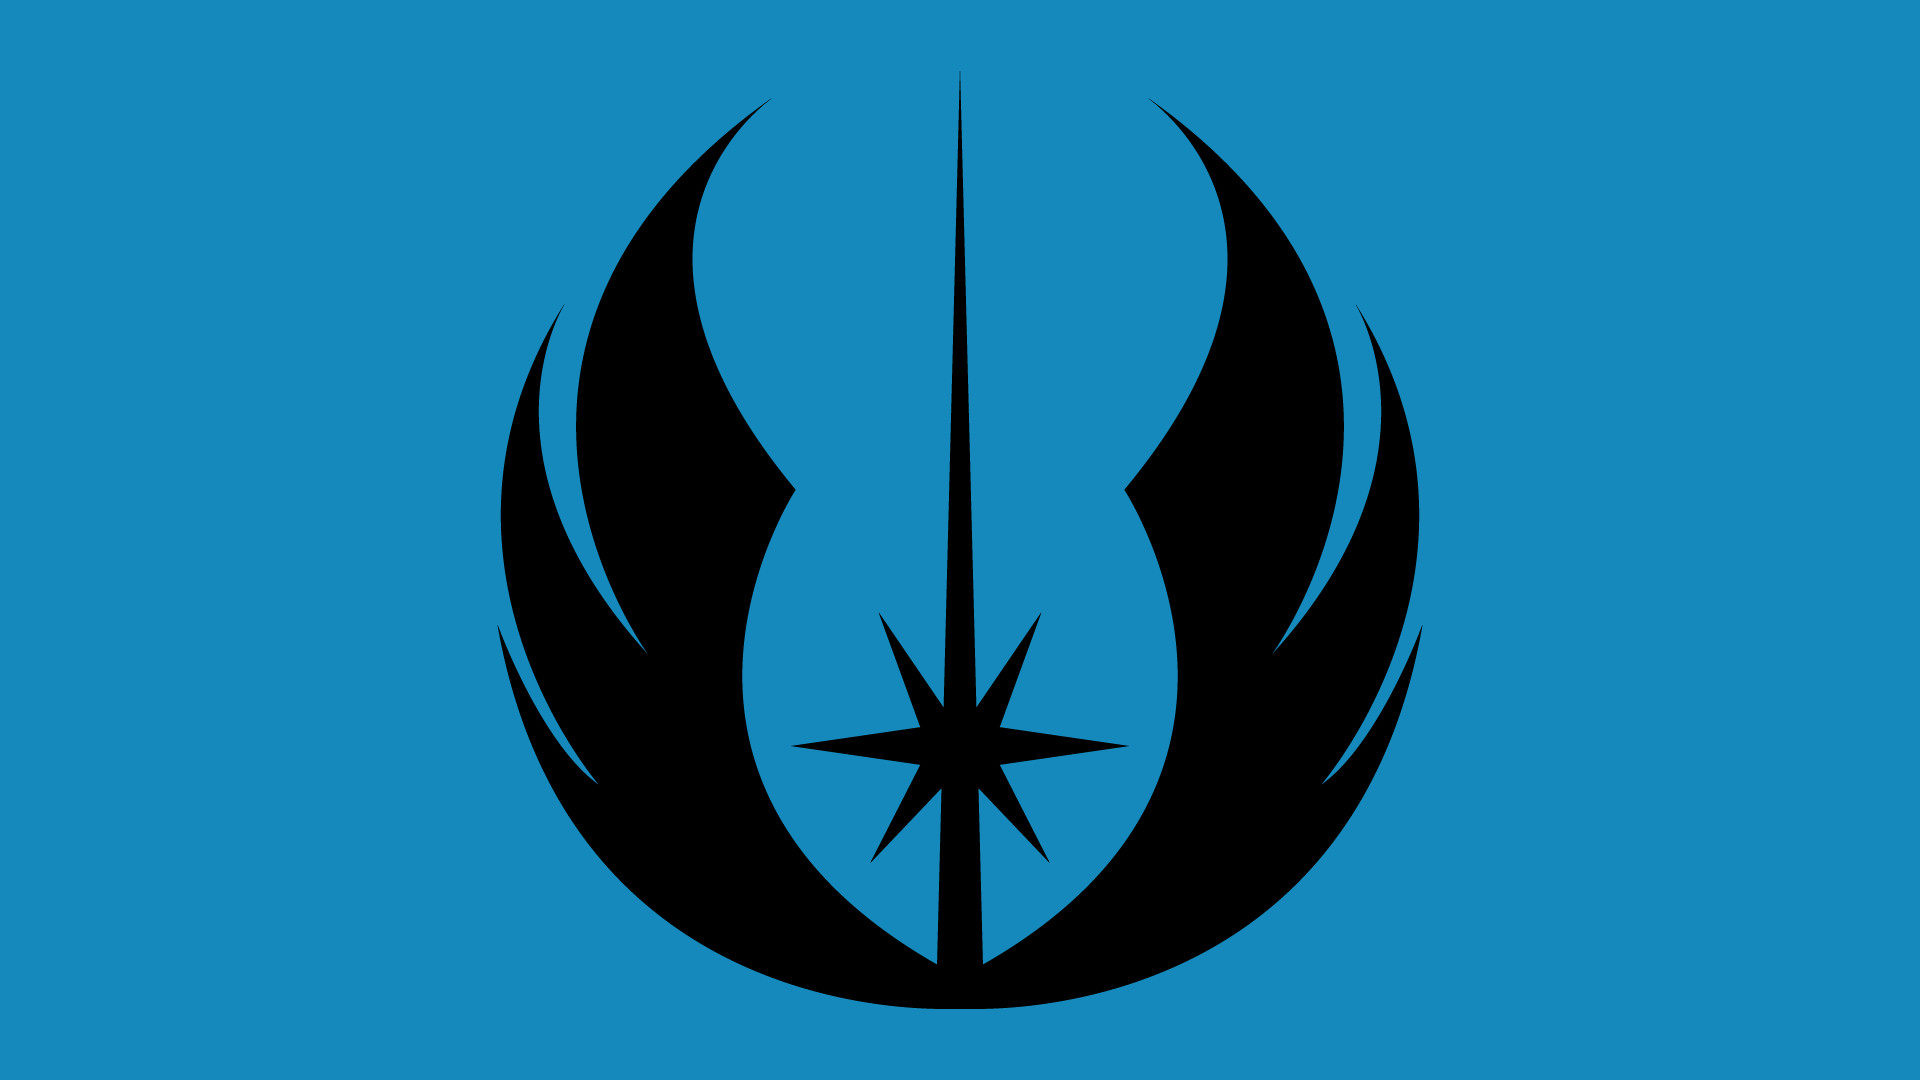 Jedi Logo by Inferna-assassin on DeviantArt